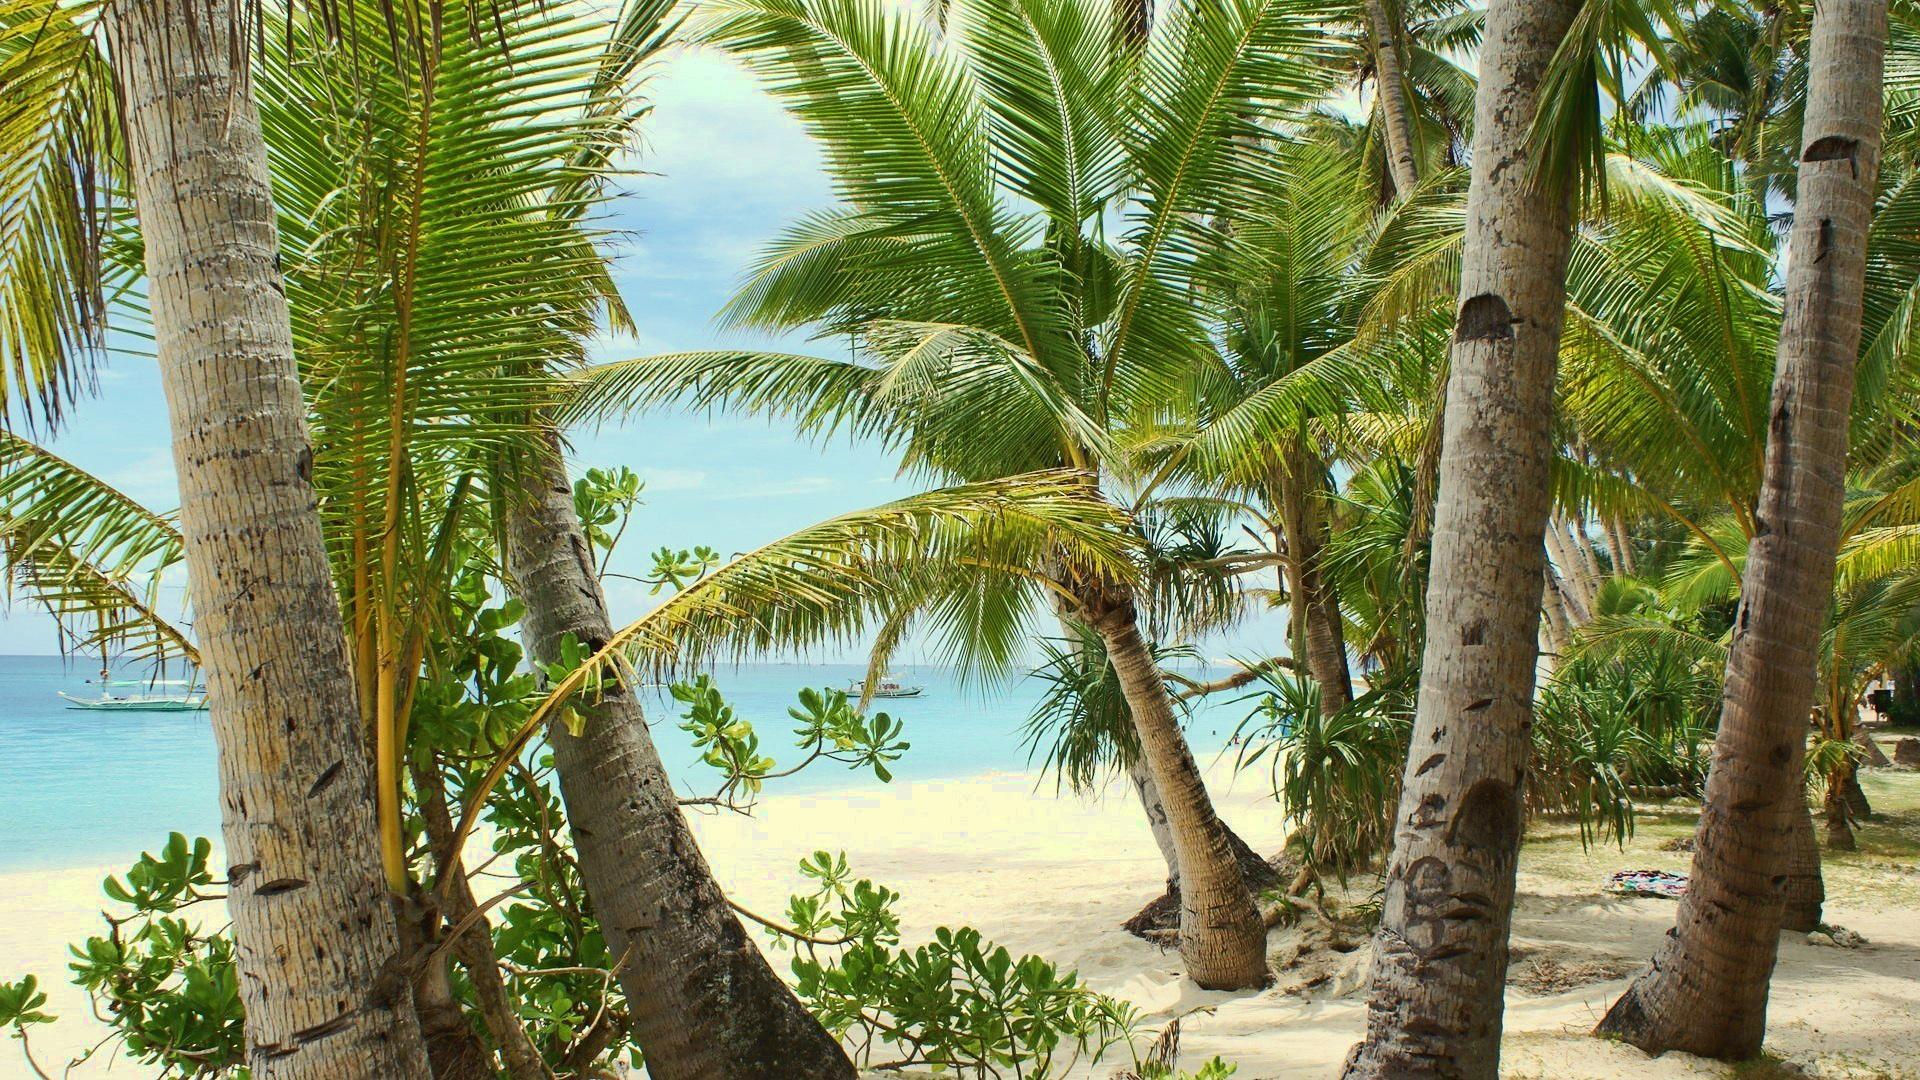 пальма фонарики ствол онлайн